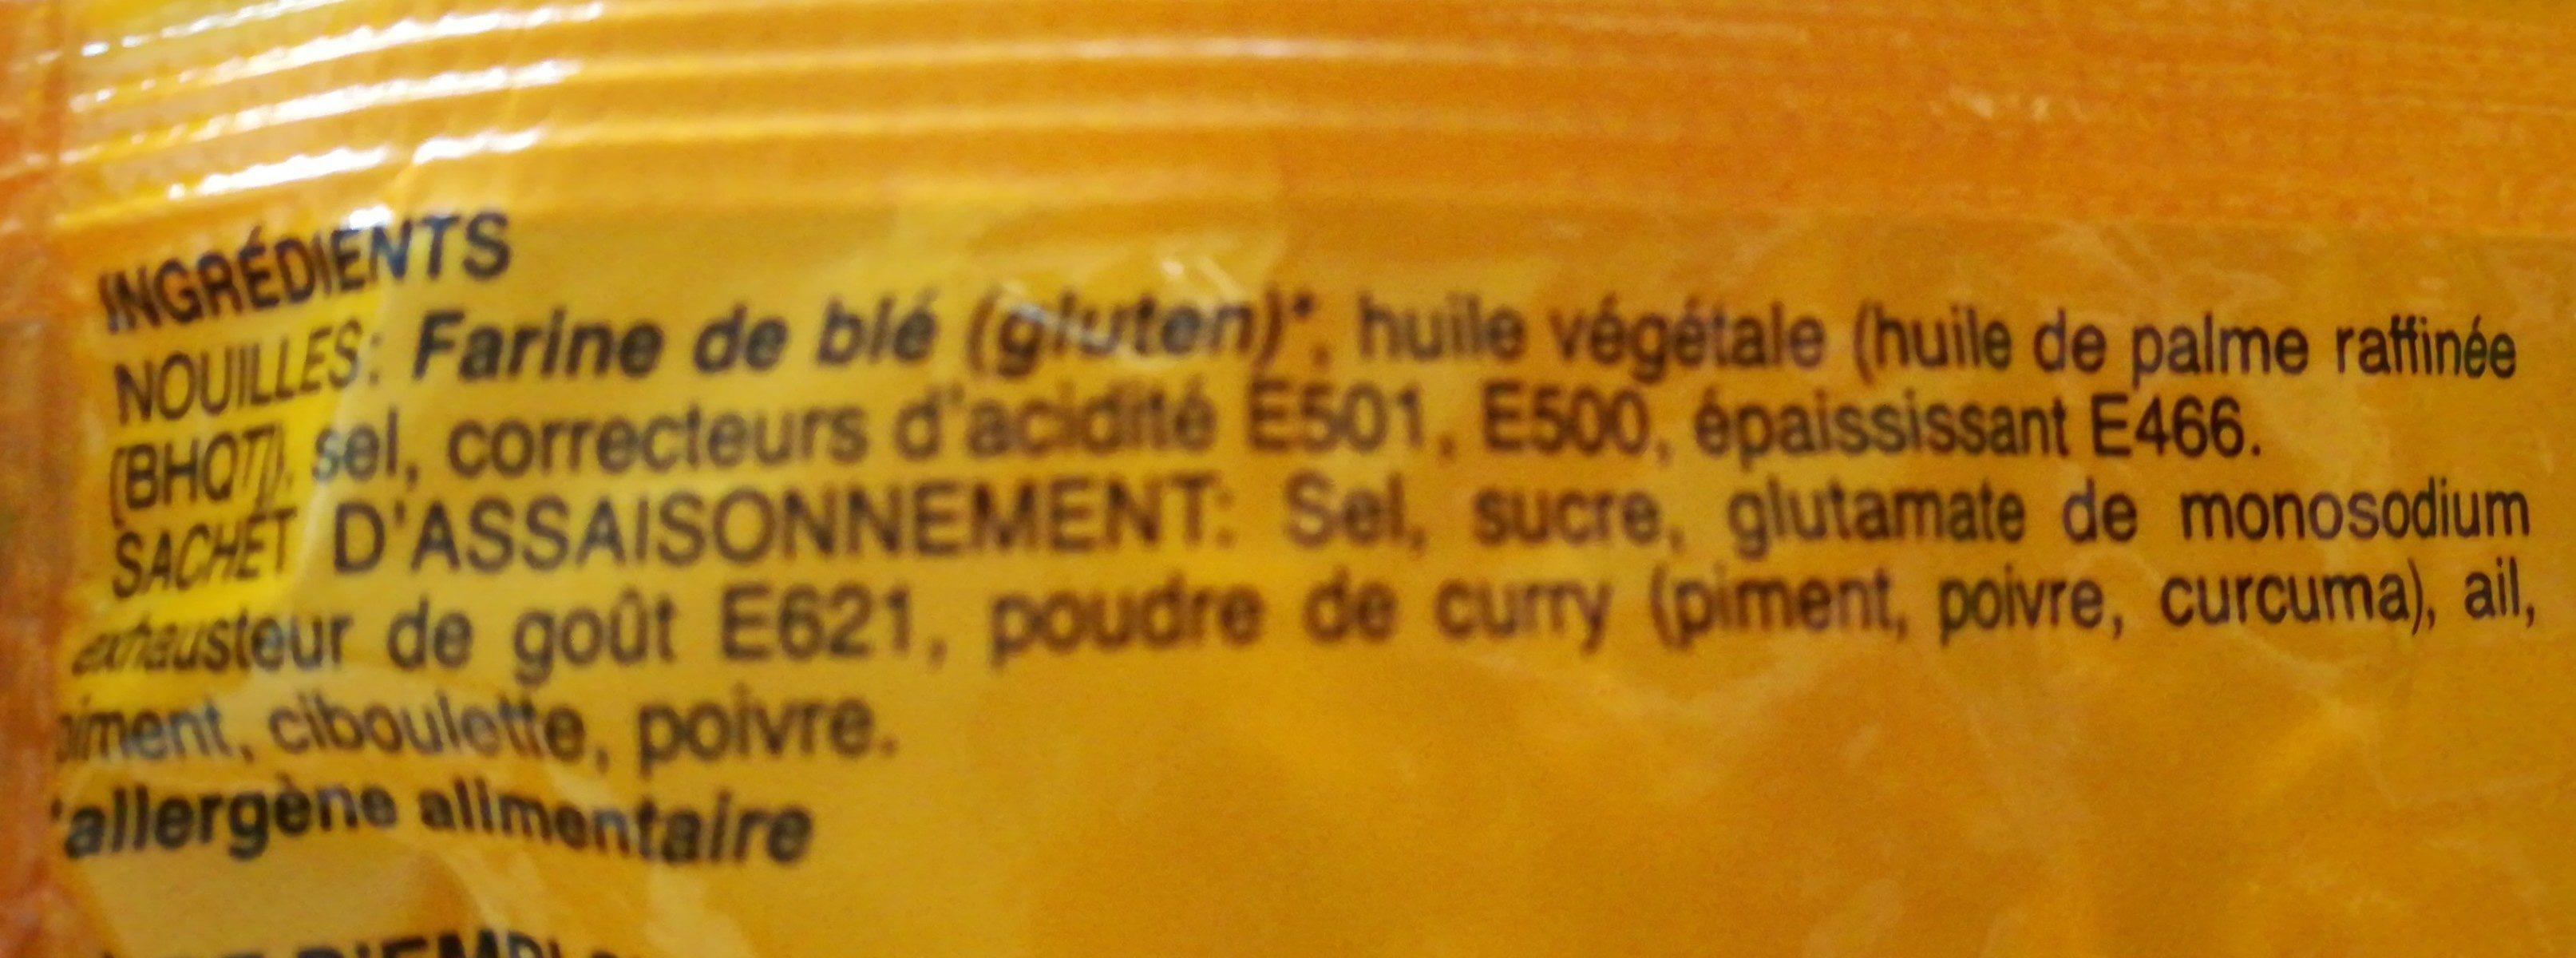 Nouilles - Saveur Curry - Ingredients - fr